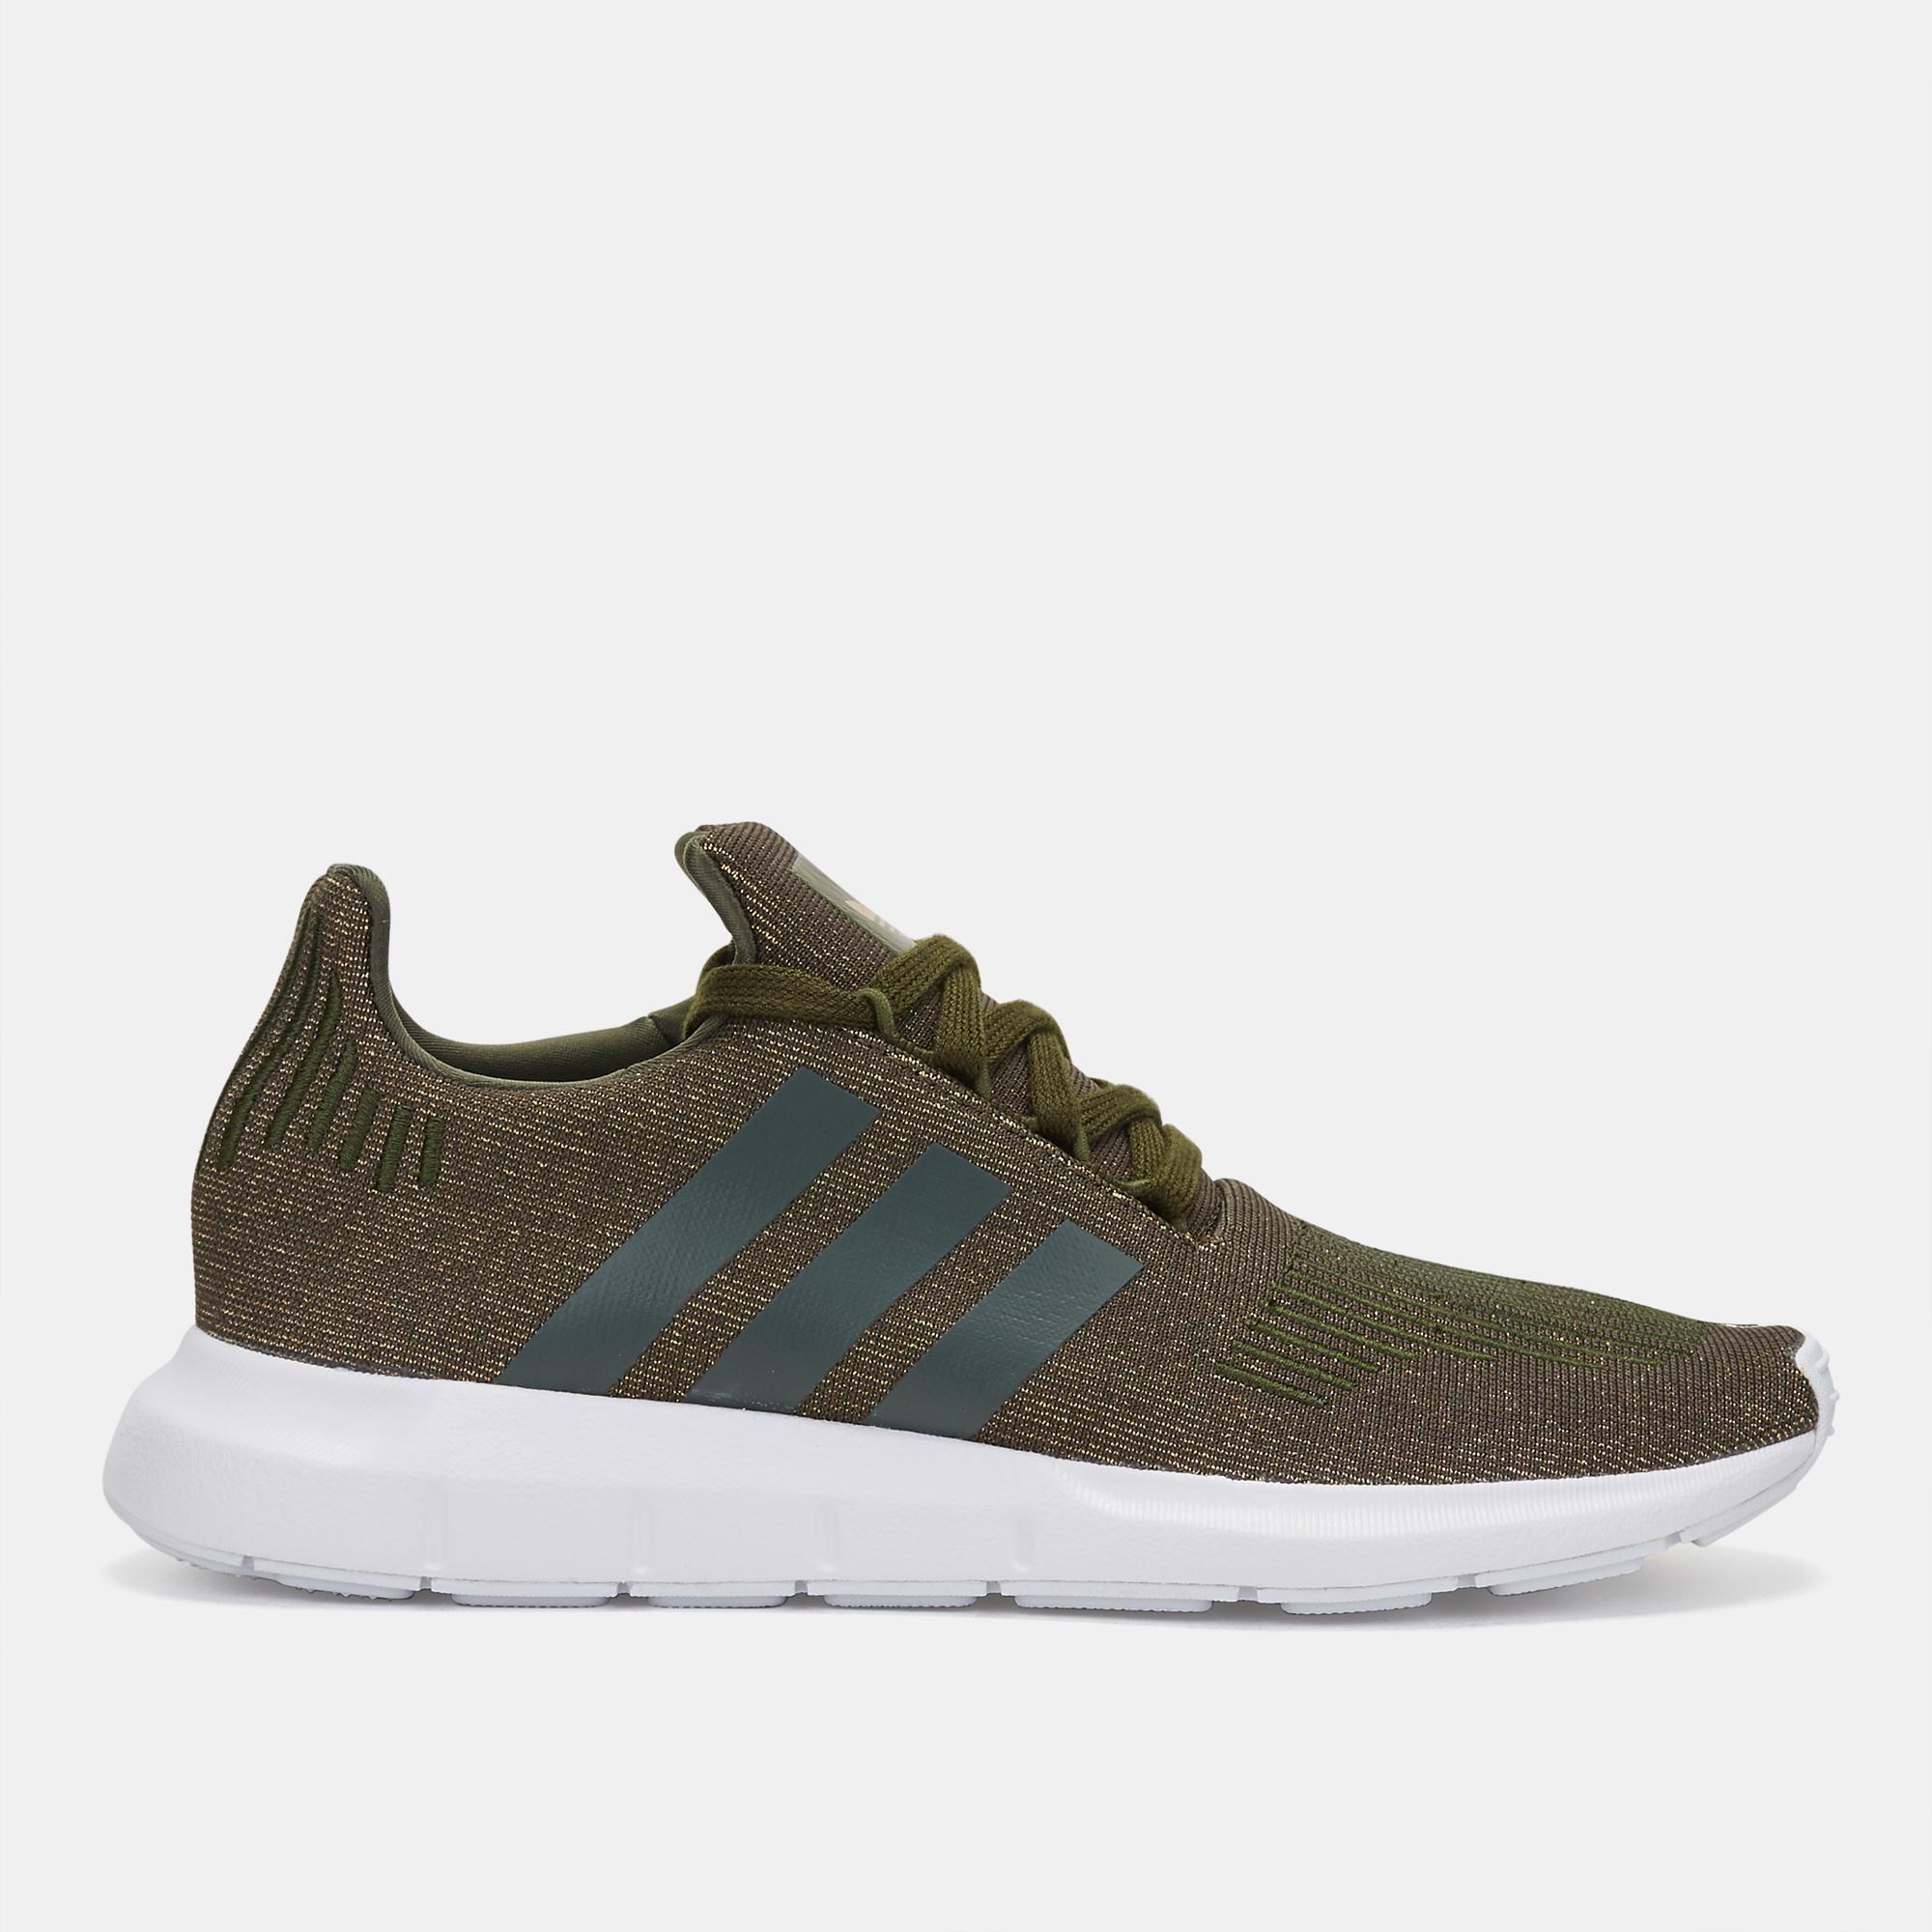 f9ad44824cced Shop Green adidas Originals Swift Run Shoe for Womens by adidas Originals